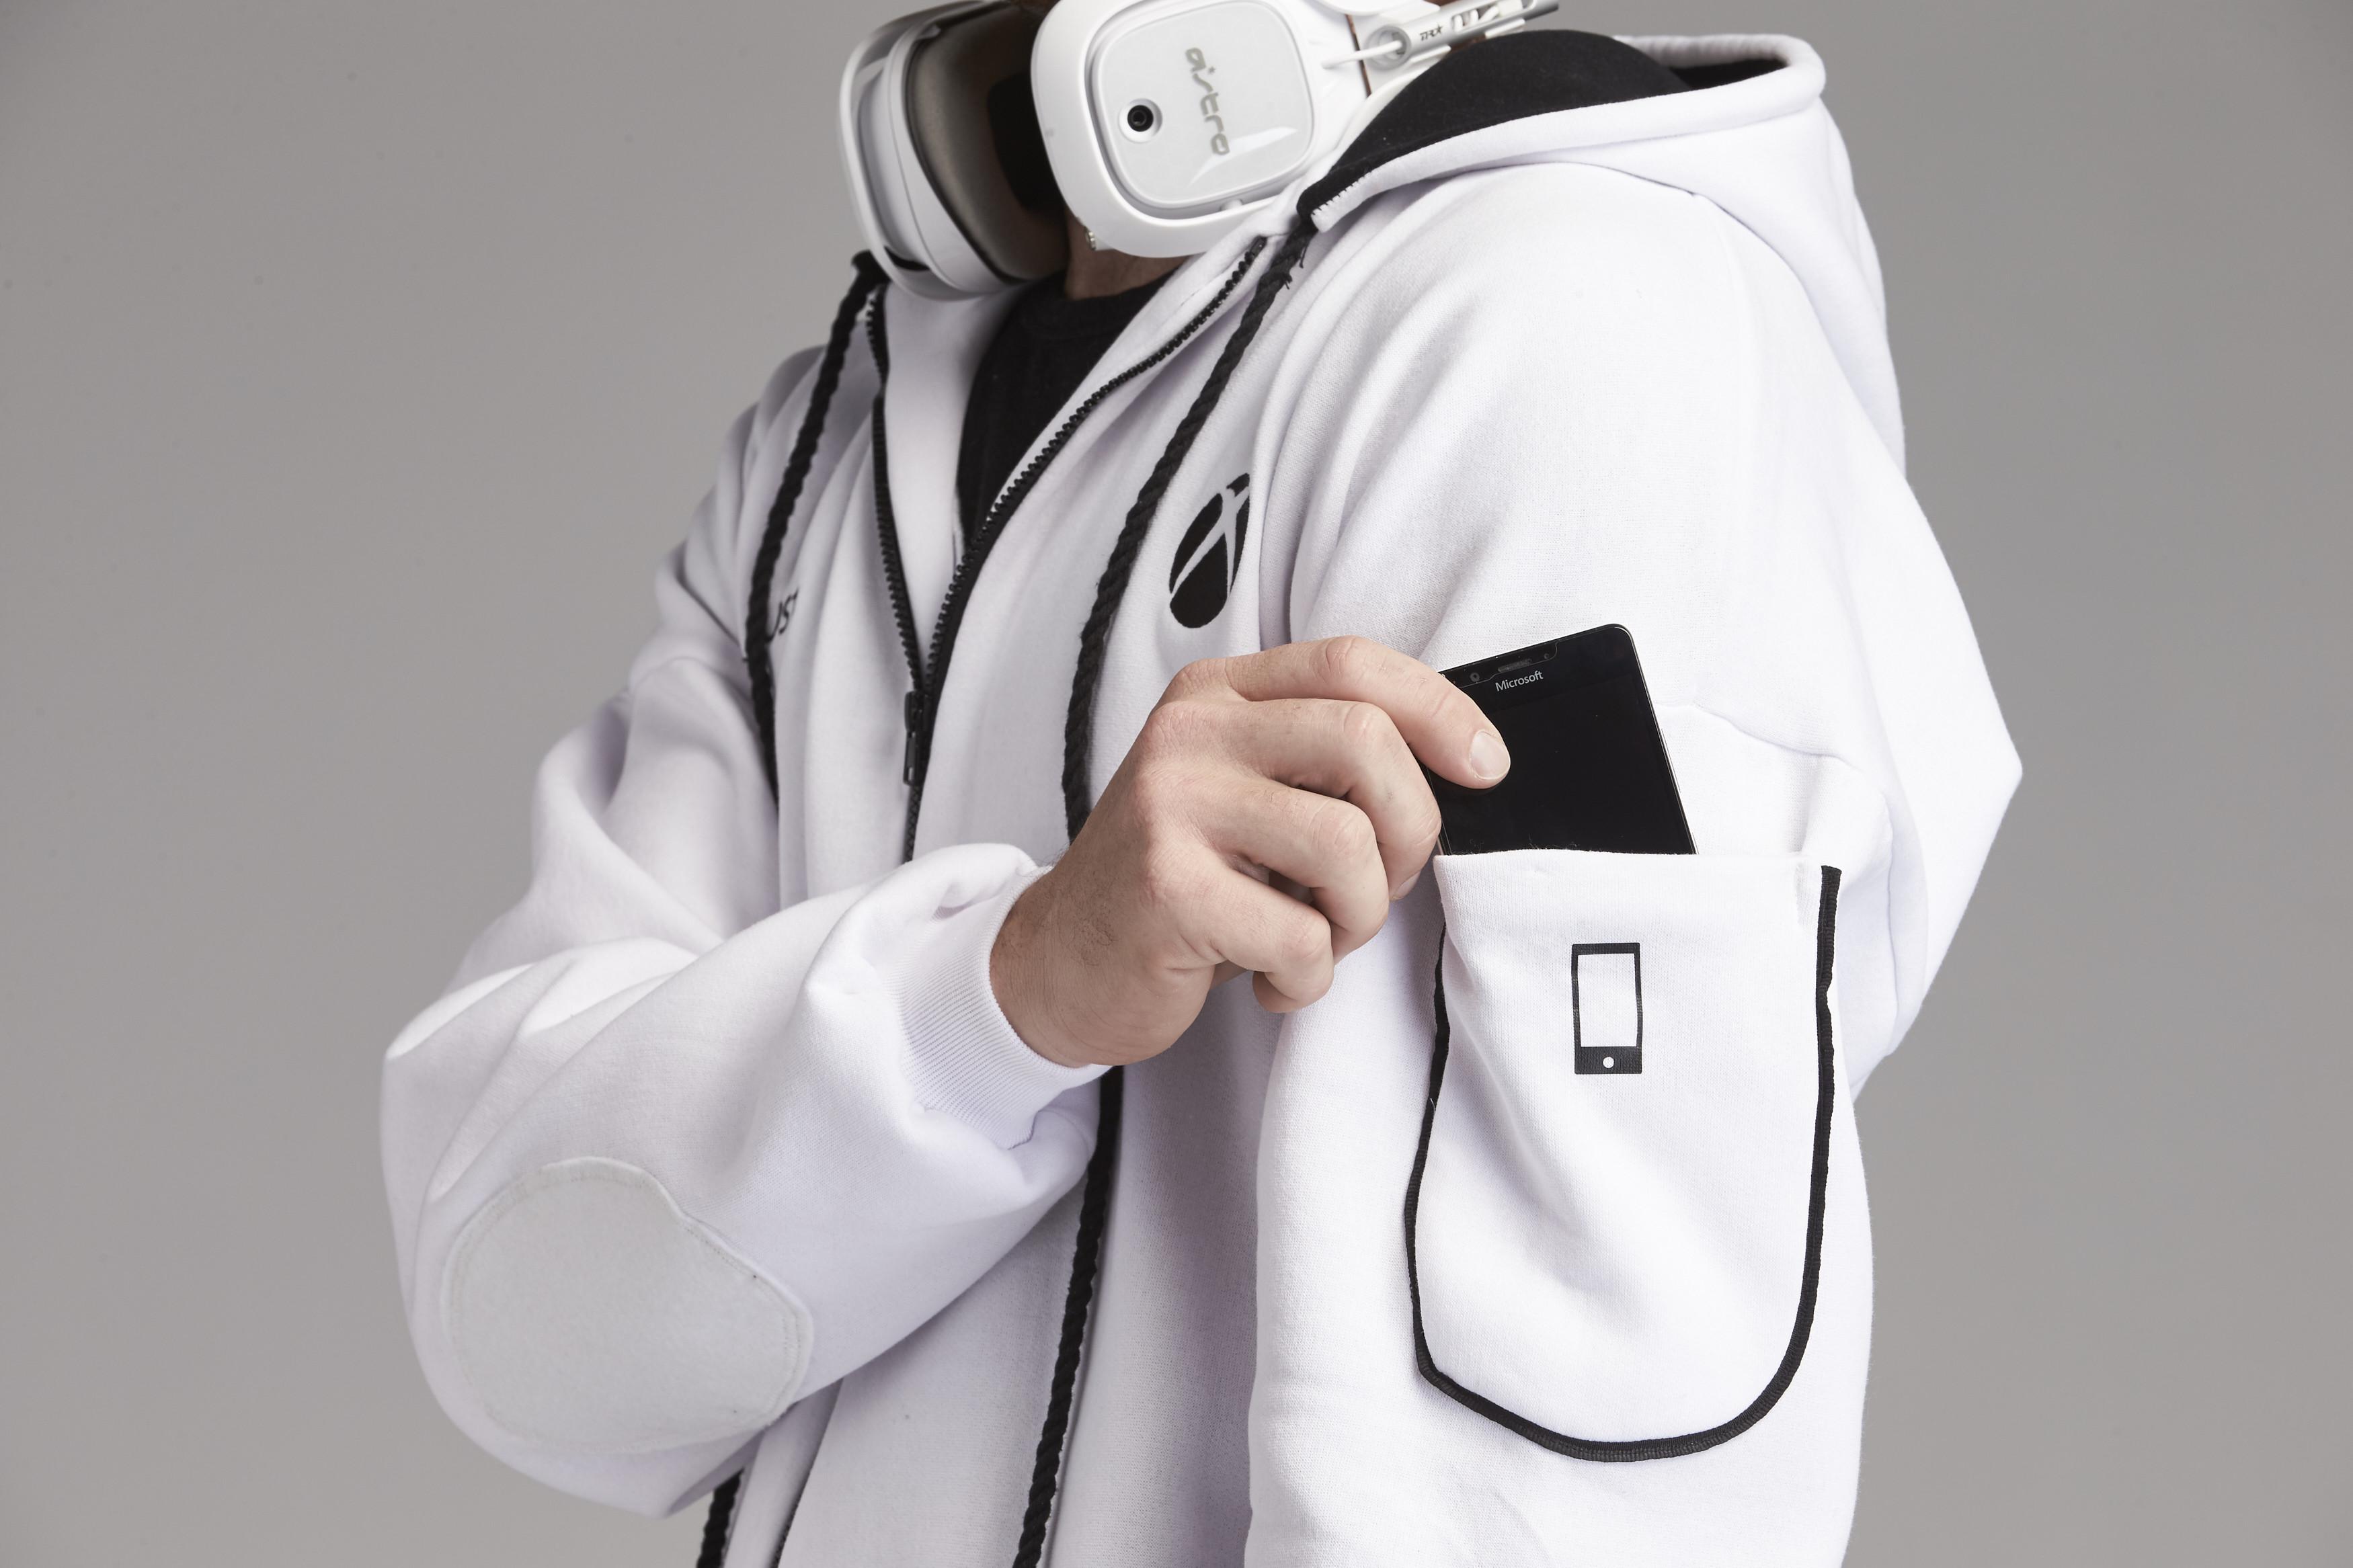 https://www.neowin.net/images/galleries/2960/1471949206_xbox-onesie-06.jpg